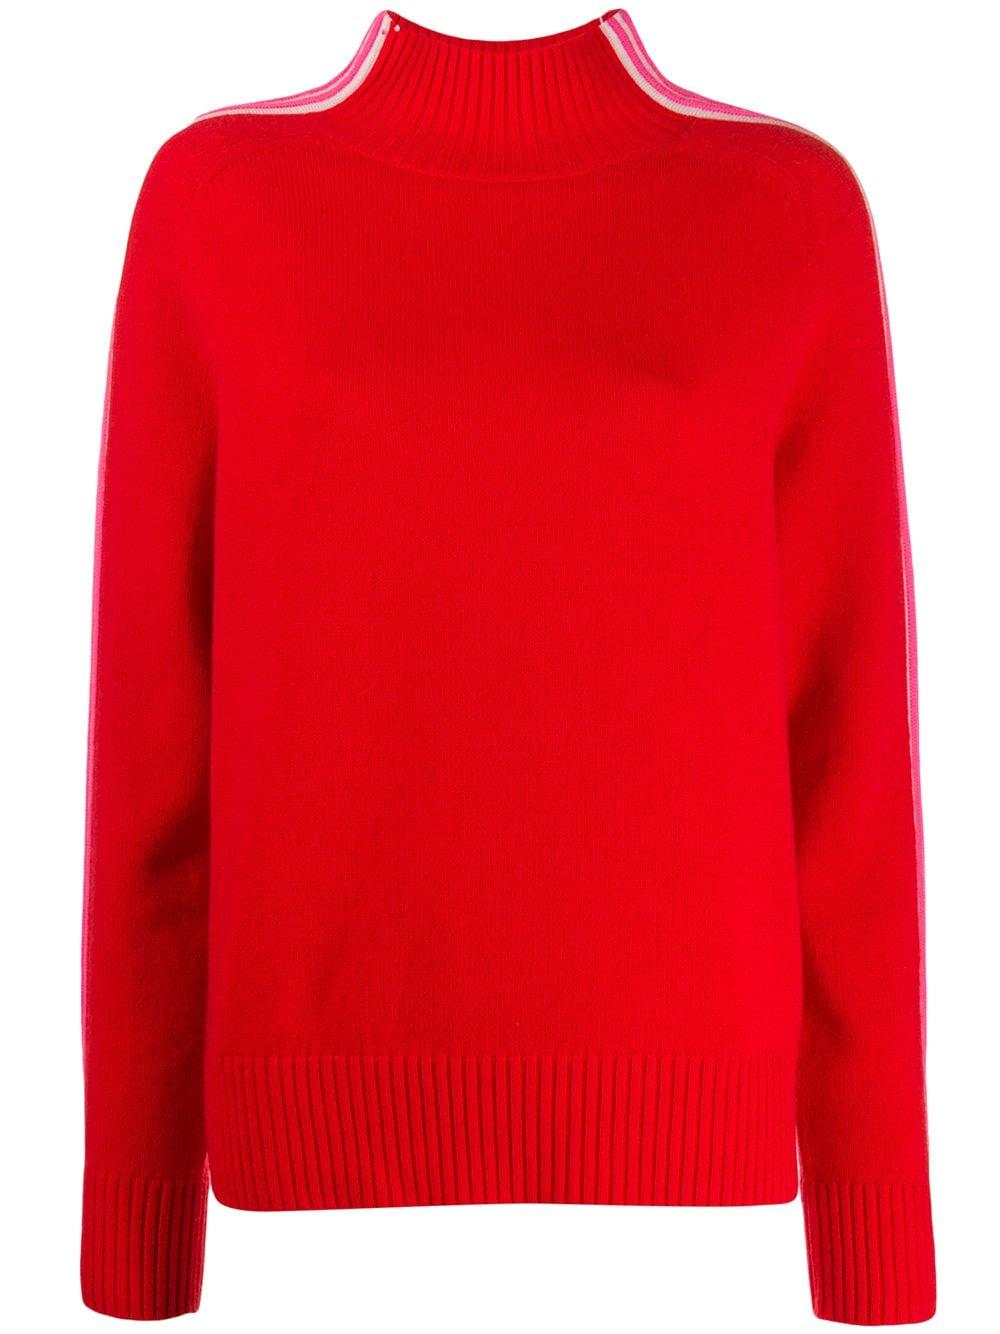 Ripple Turtleneck Sweater Item # KQ103